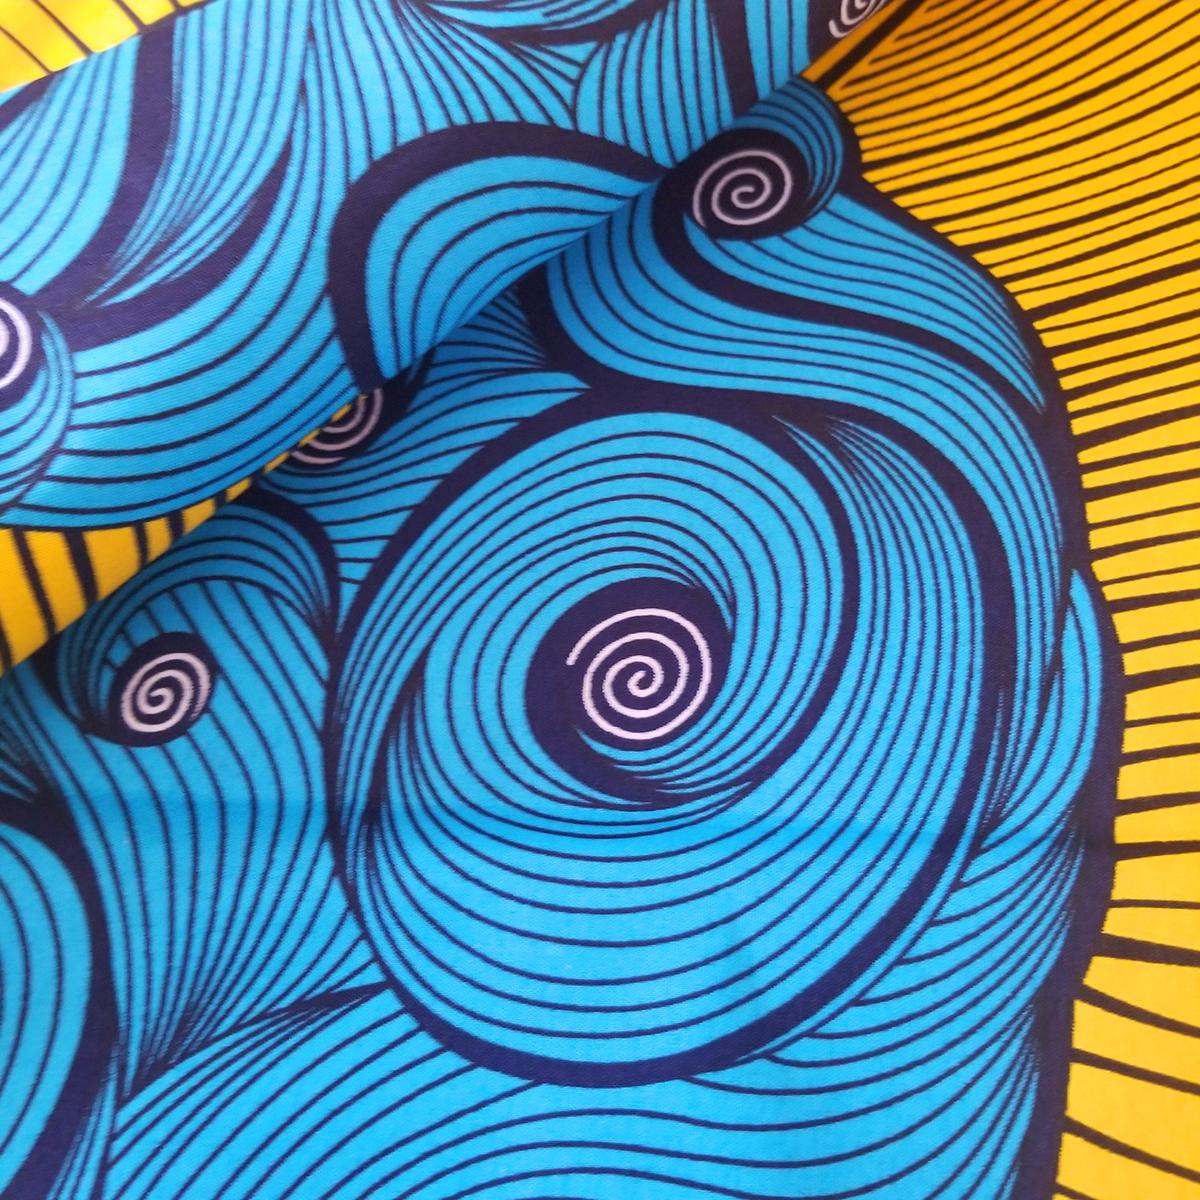 African wax print 100% Polyester wax print fabric